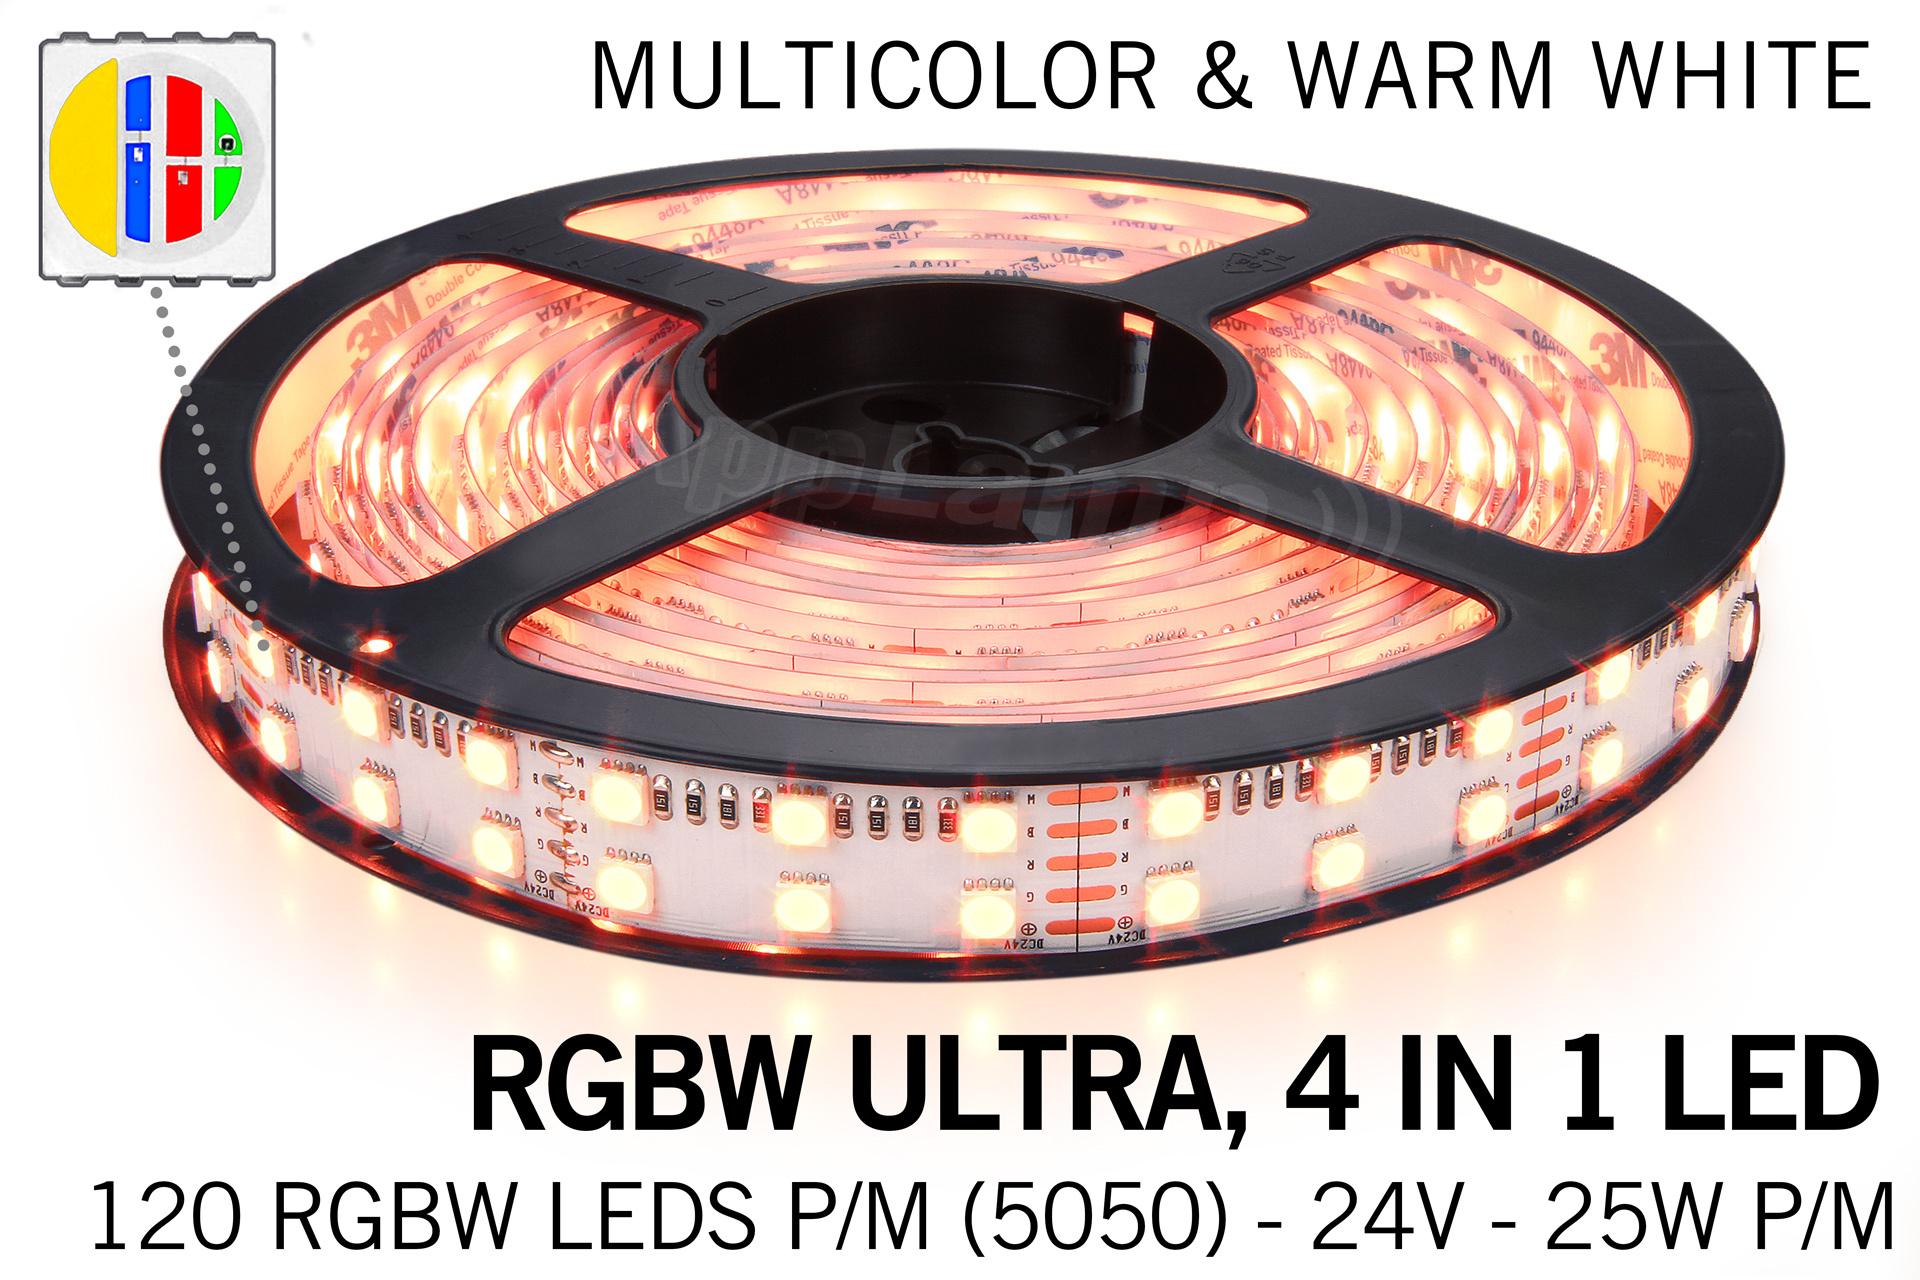 Applamp RGBW ULTRA LED strip dubbele rij 120 LED per meter, 4 IN 1 LED